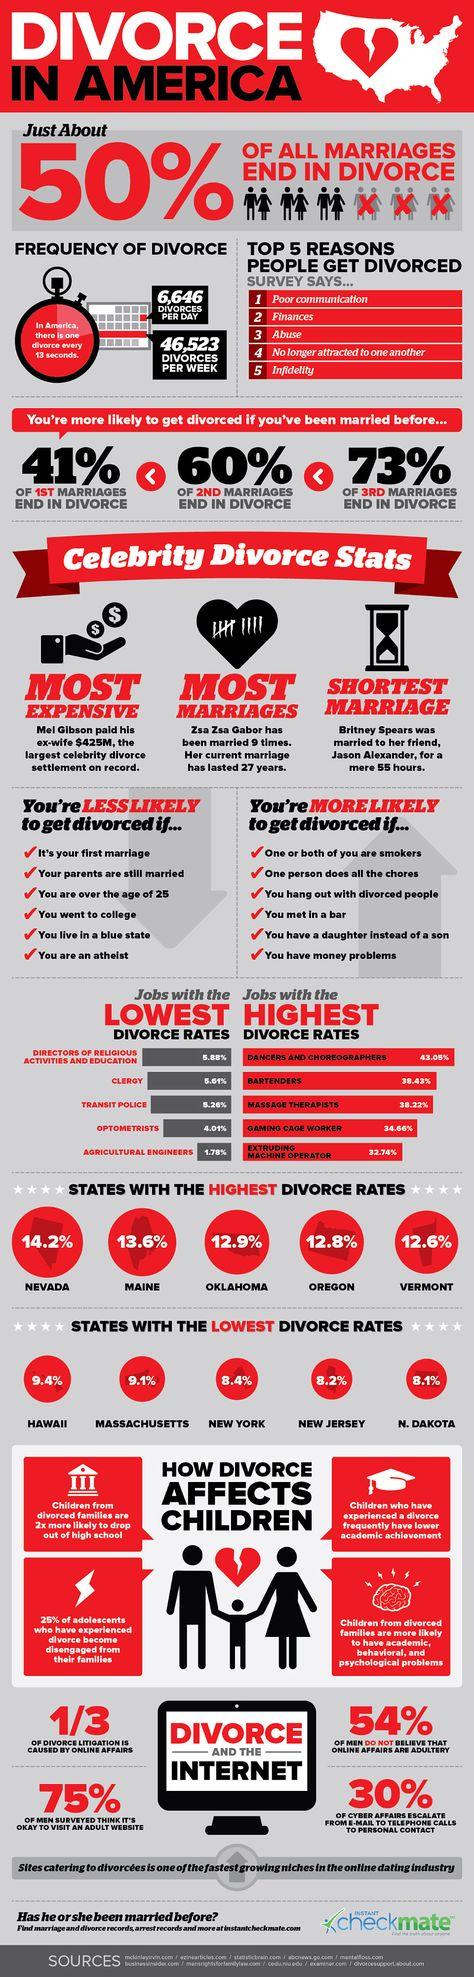 Divorce In America  #Infographic #Divorce #America